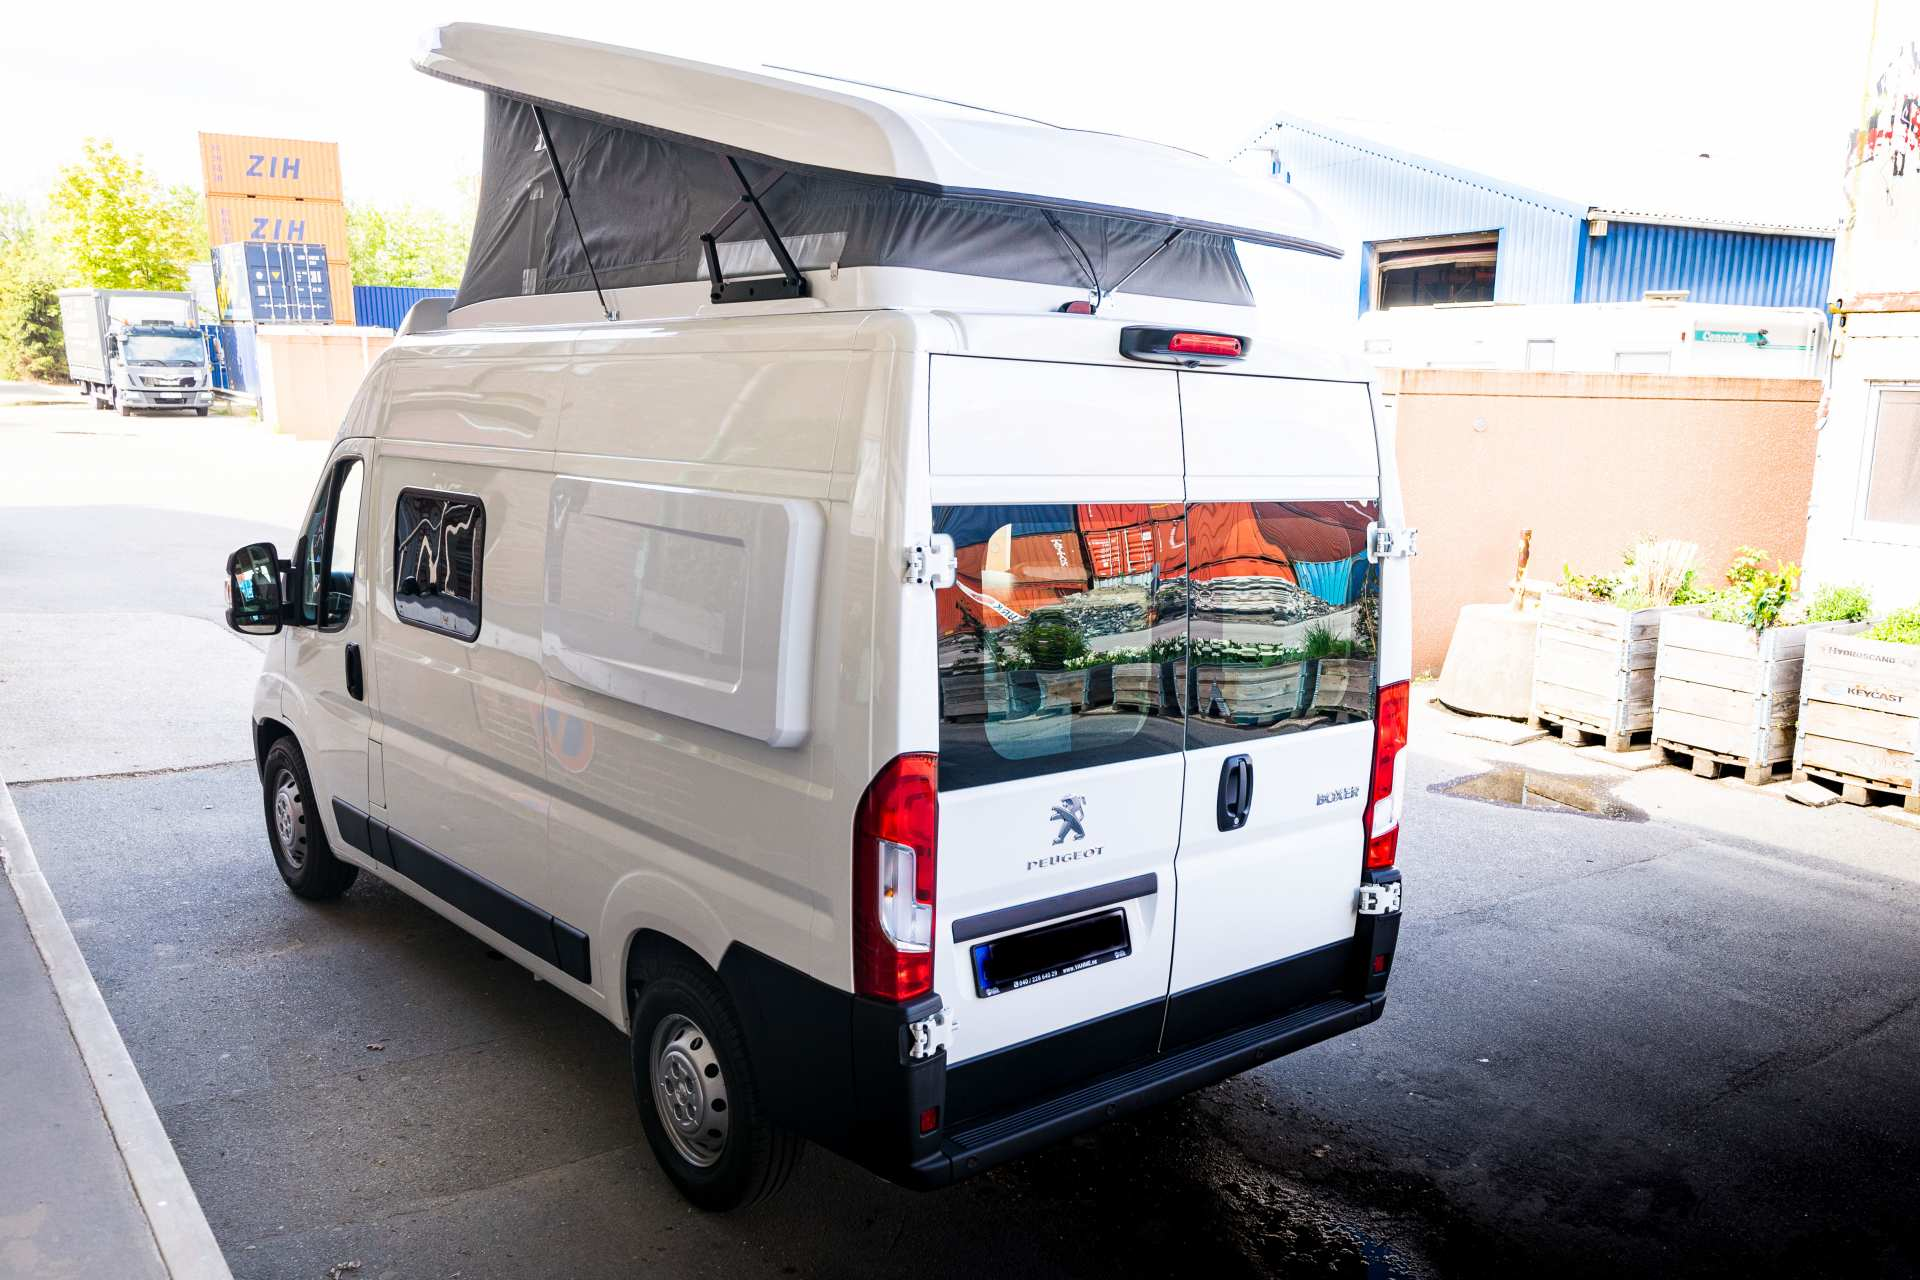 Individualausbau: Zwei-Raumwohnung Peugeot Boxer L2 H2 - 2